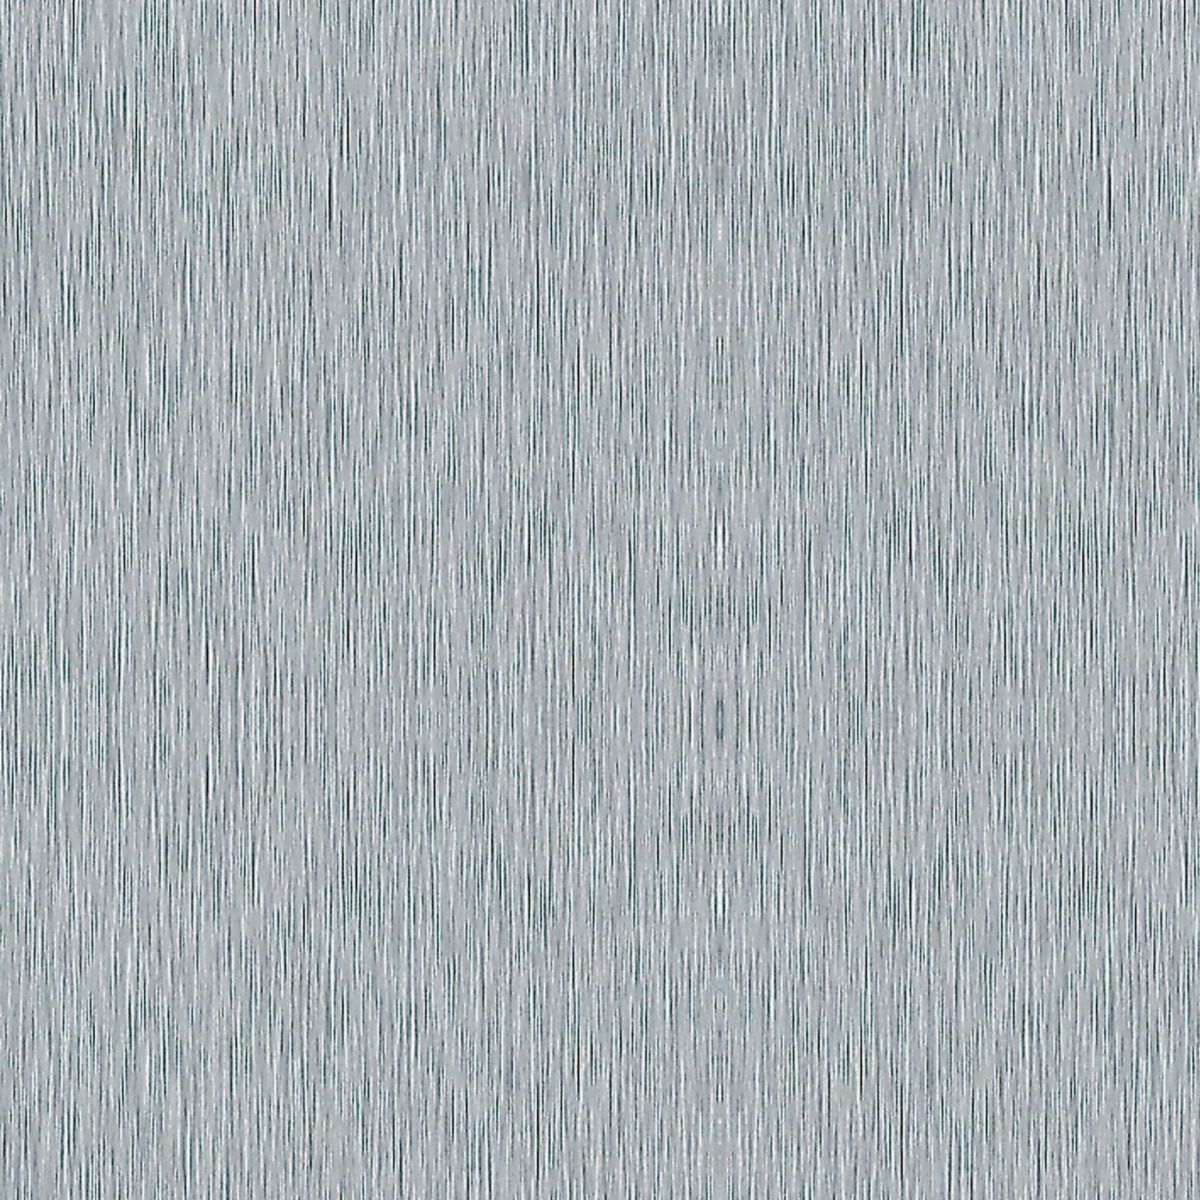 Prix Feuille Stratifié Formica stratifié hpl standard basic métals vgs aluminium m4896 brm brushed pel 1  face 305x122cm 0,7mm